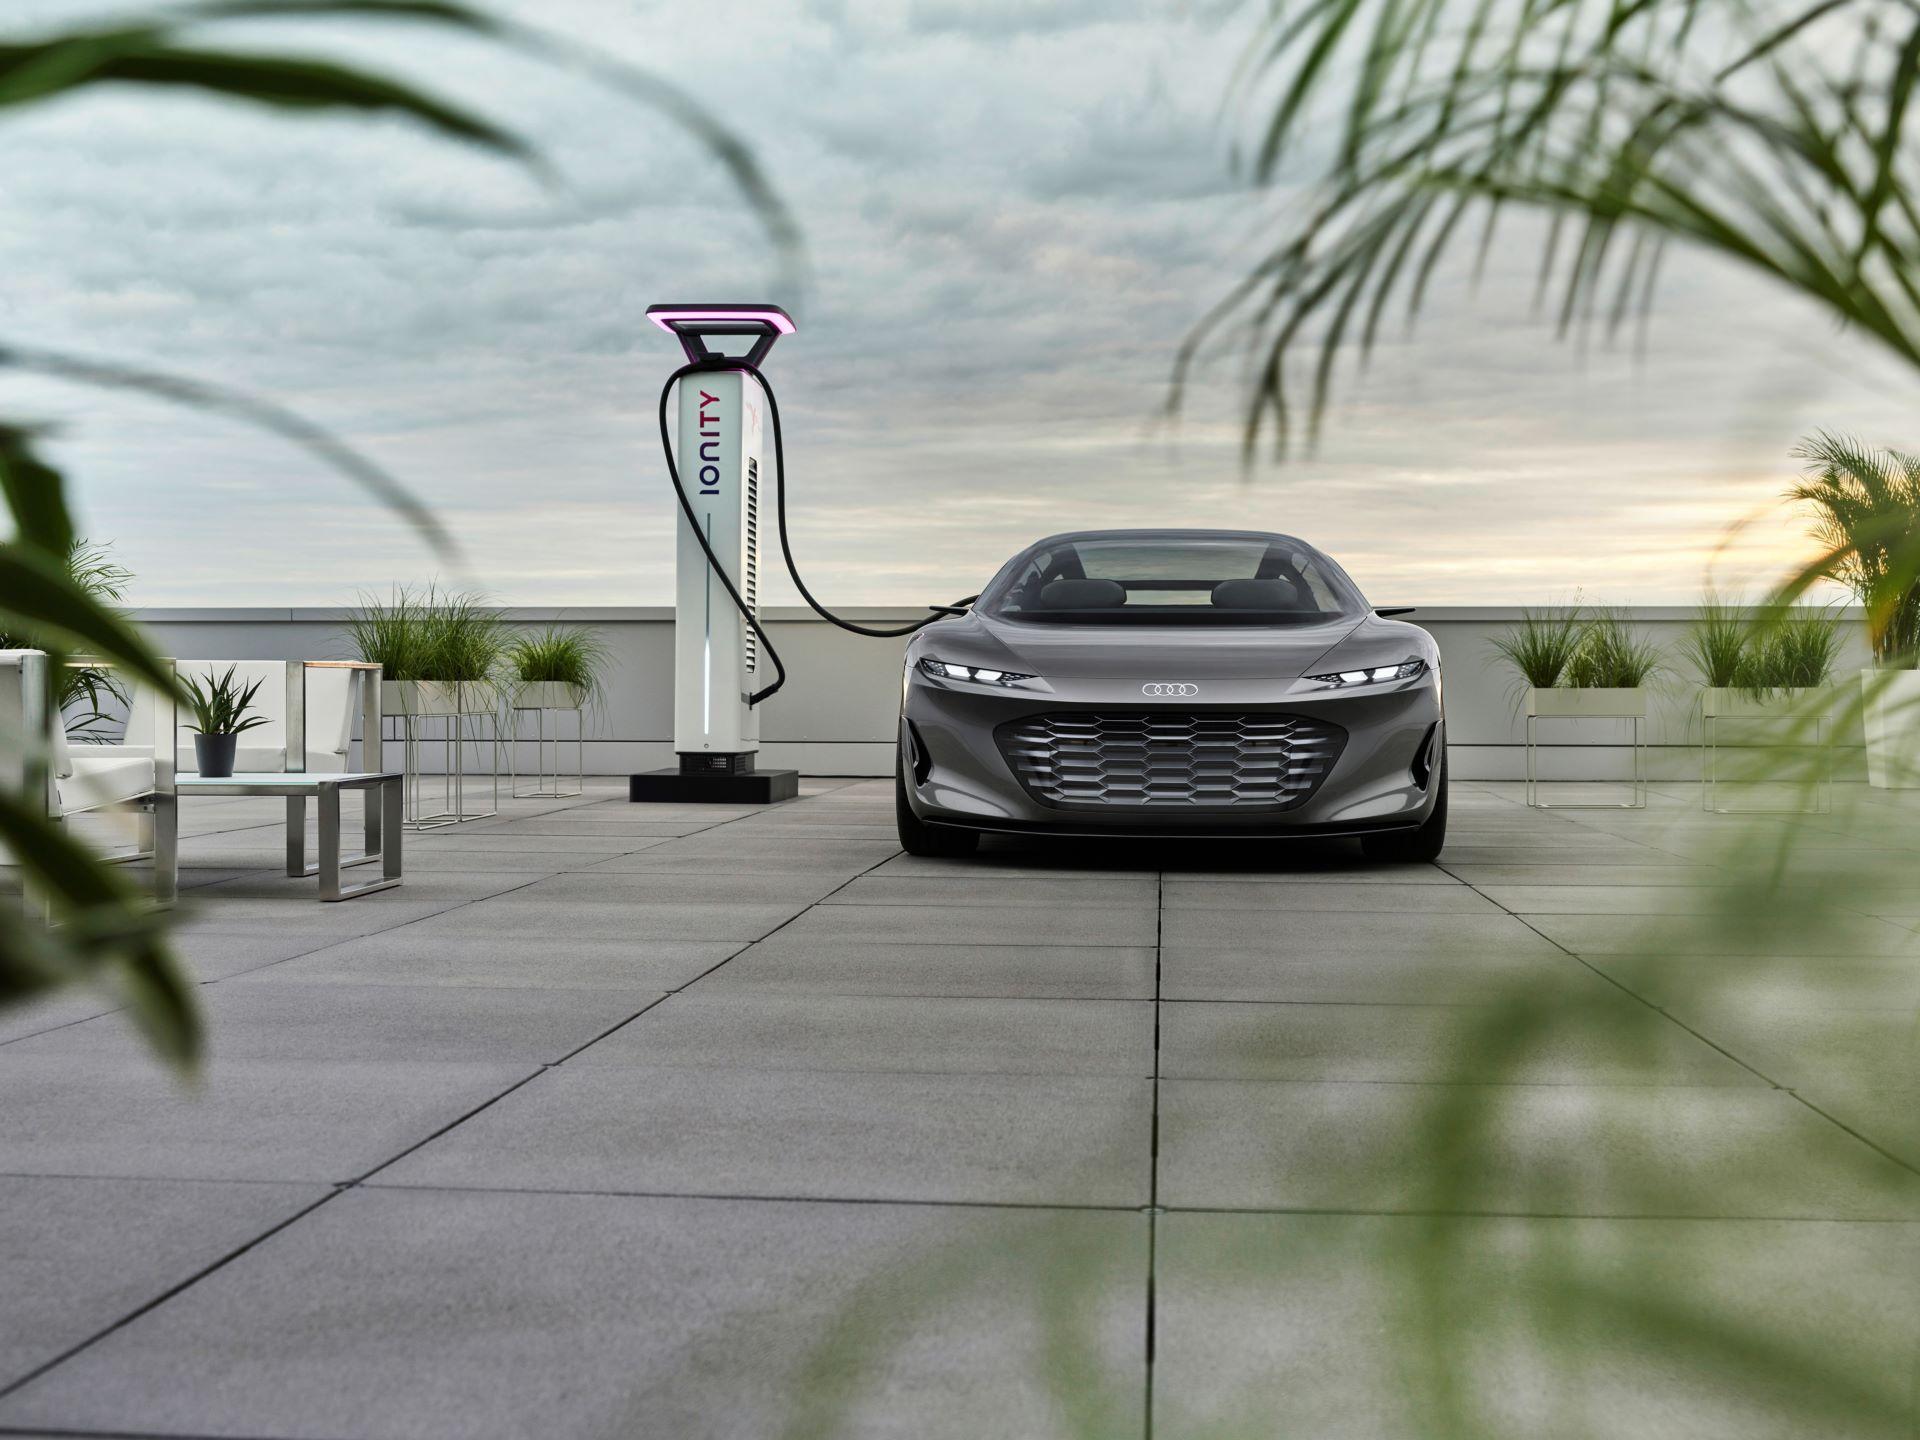 Audi-GrandSphere-concept-7